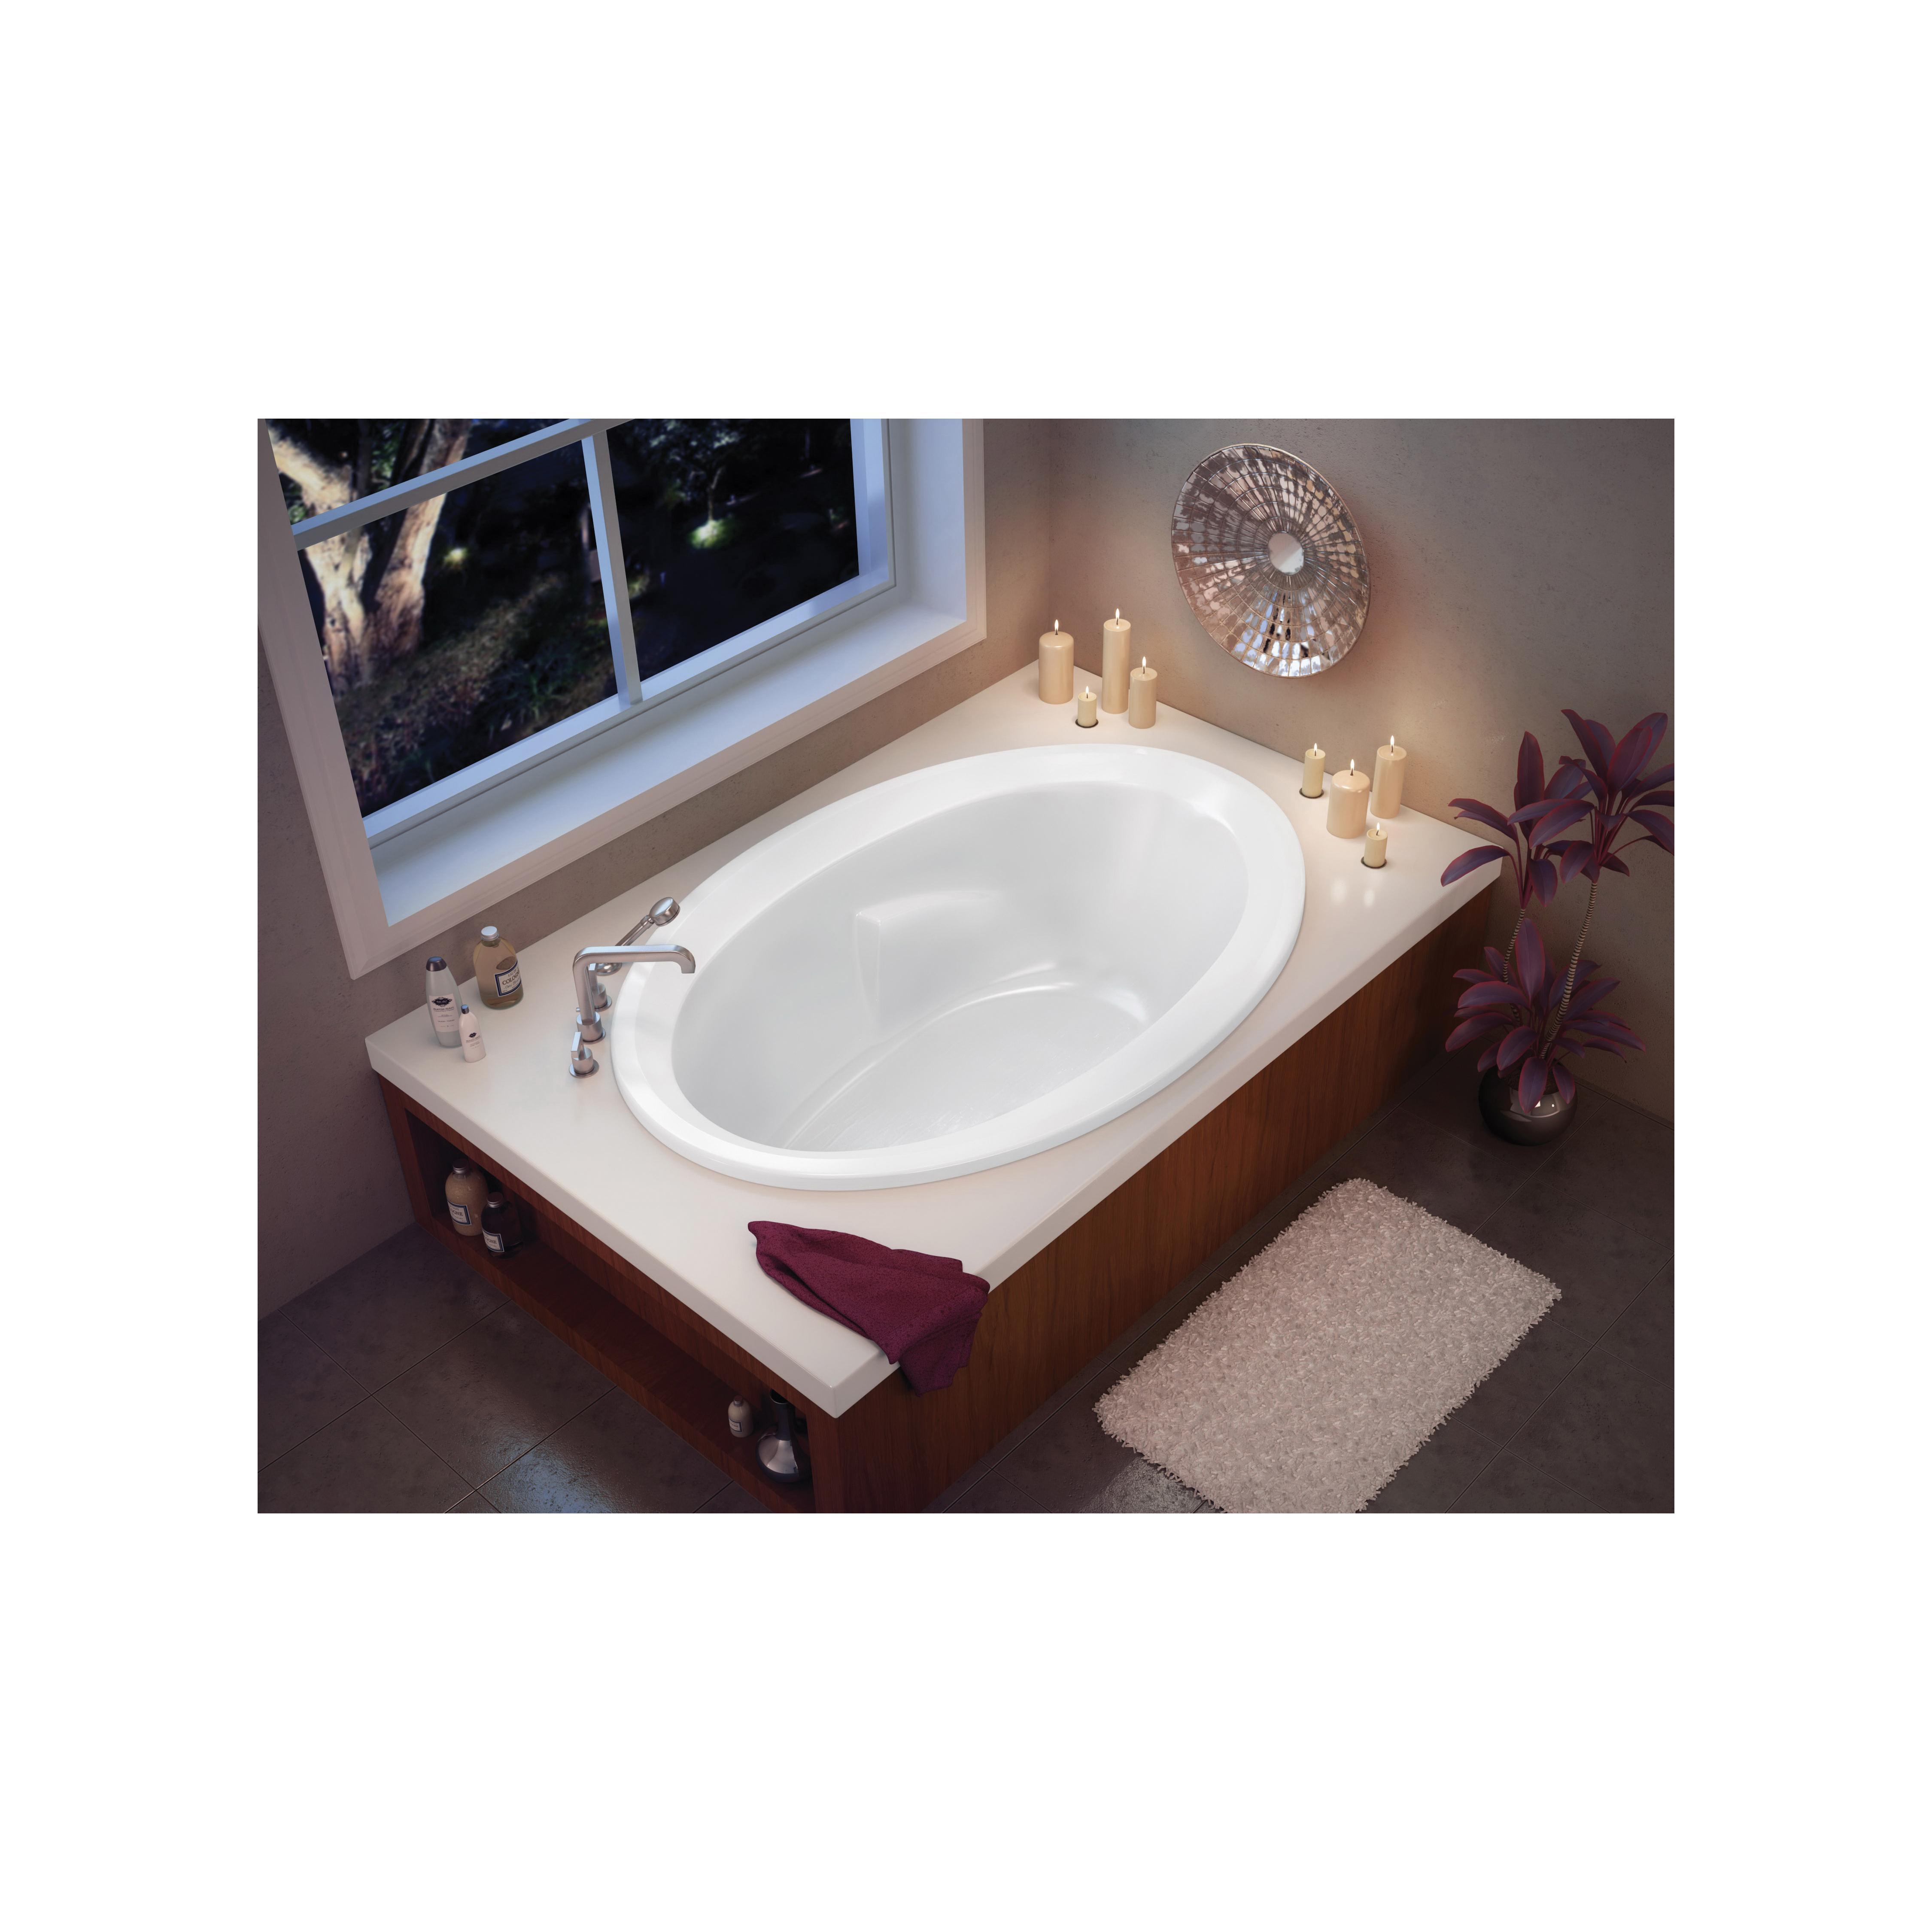 Consolidated Supply Co. | MAAX® 100021 TwiLight™ Bathtub With ...